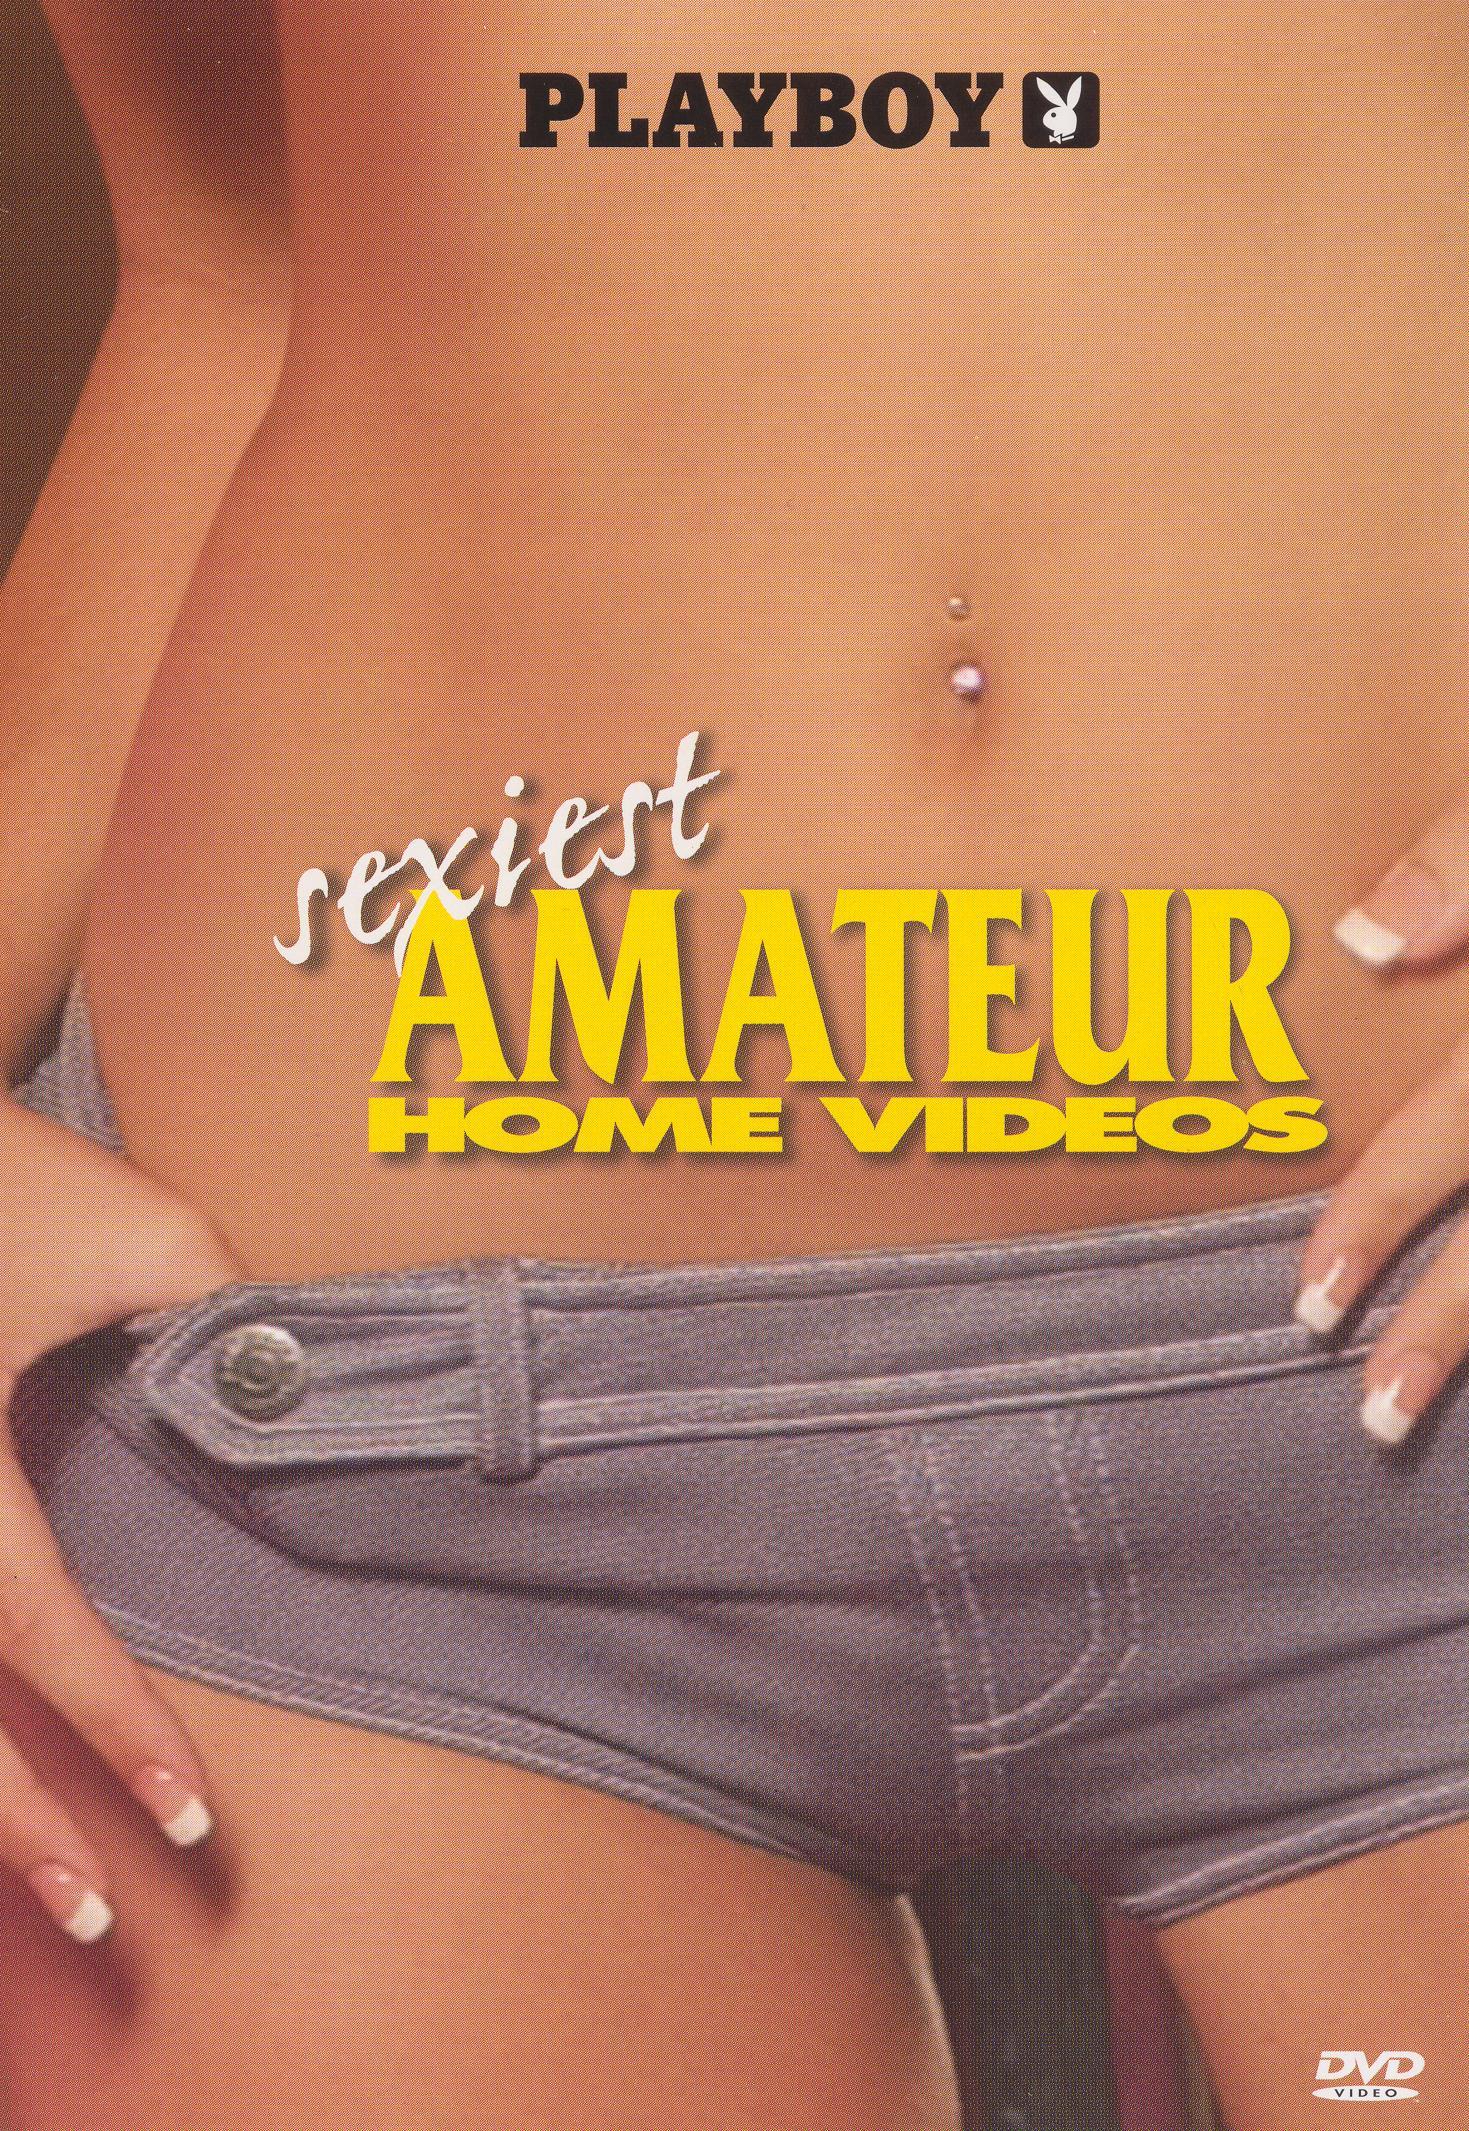 Playboy: Sexiest Amateur Home Videos